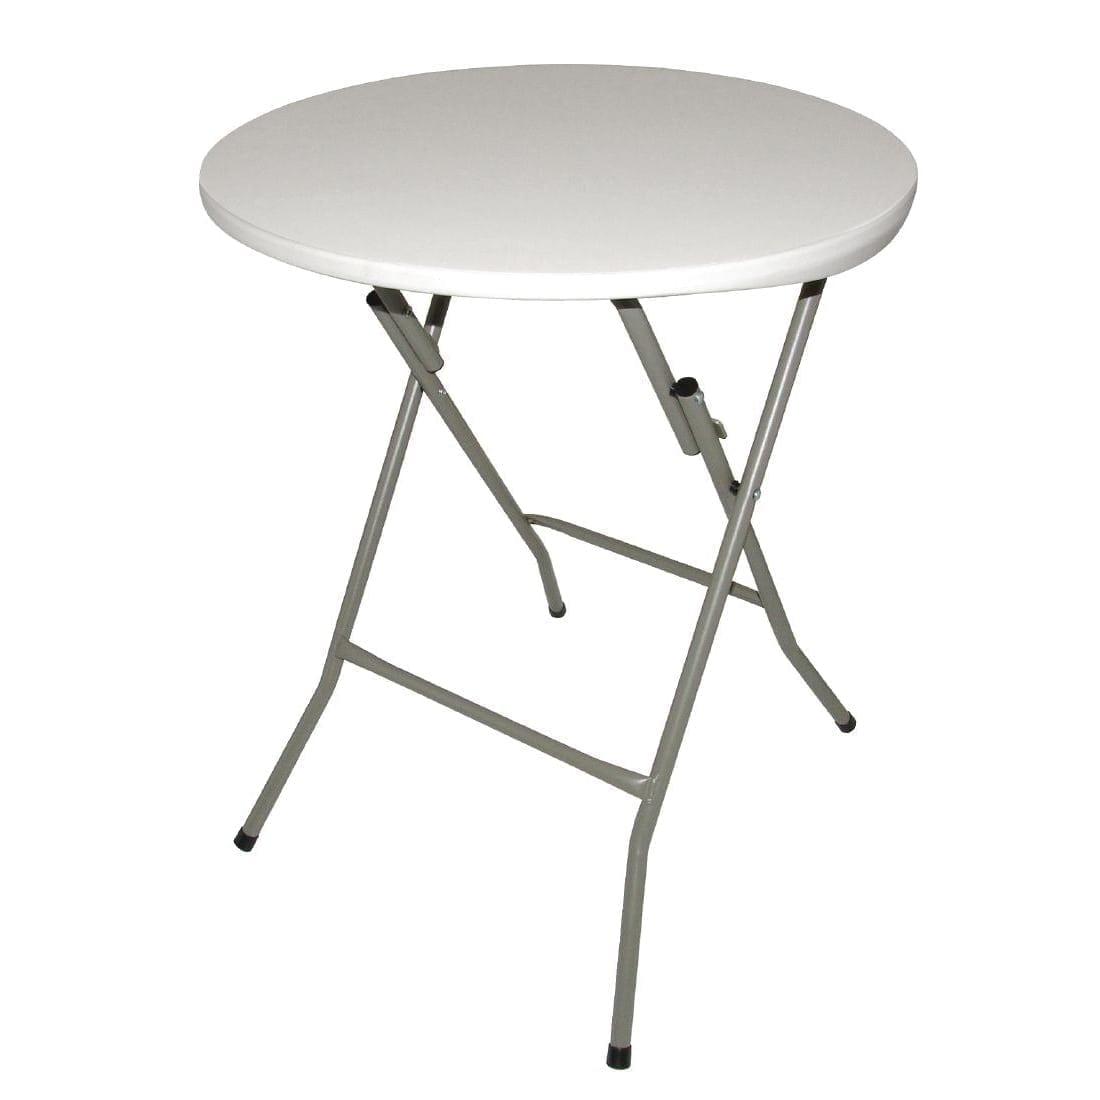 Bolero Foldaway Round Table - 600mm diameter-0